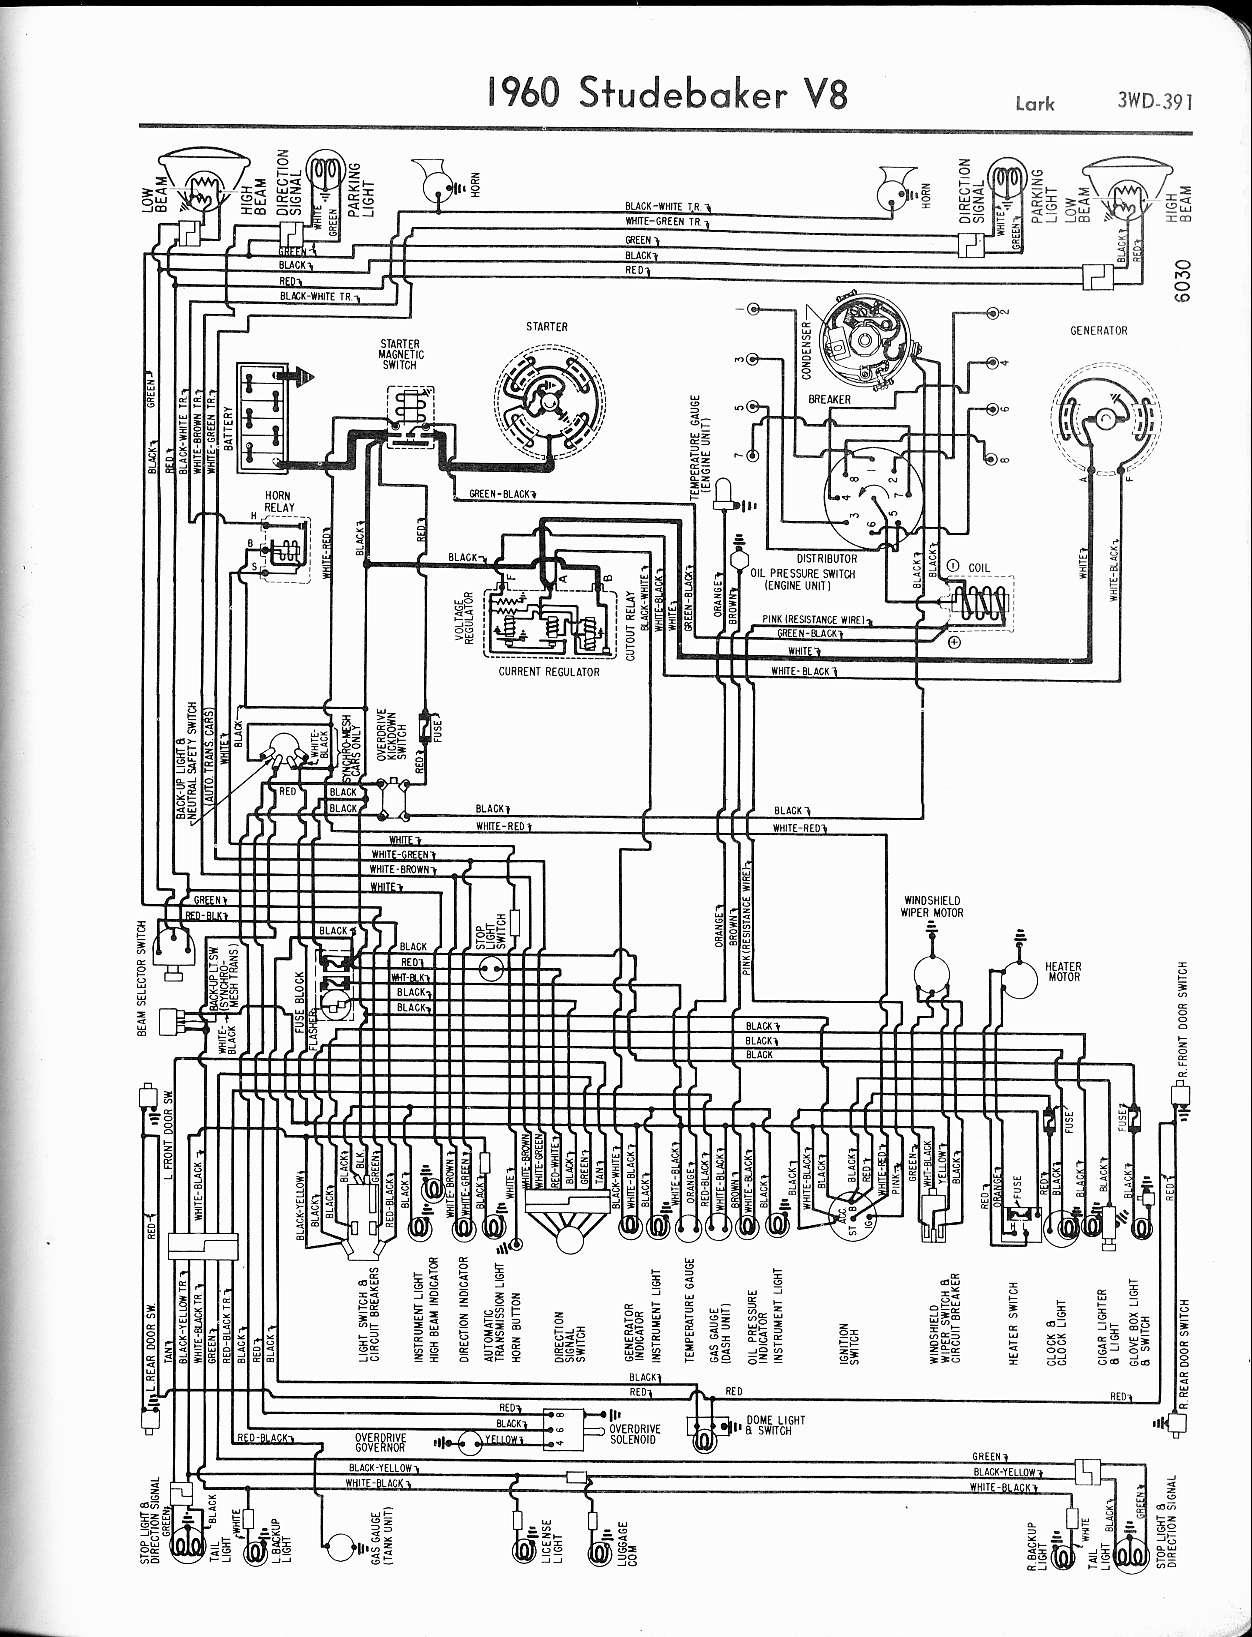 1940 studebaker wiring diagram schematic 1940 ford wiring diagram manual